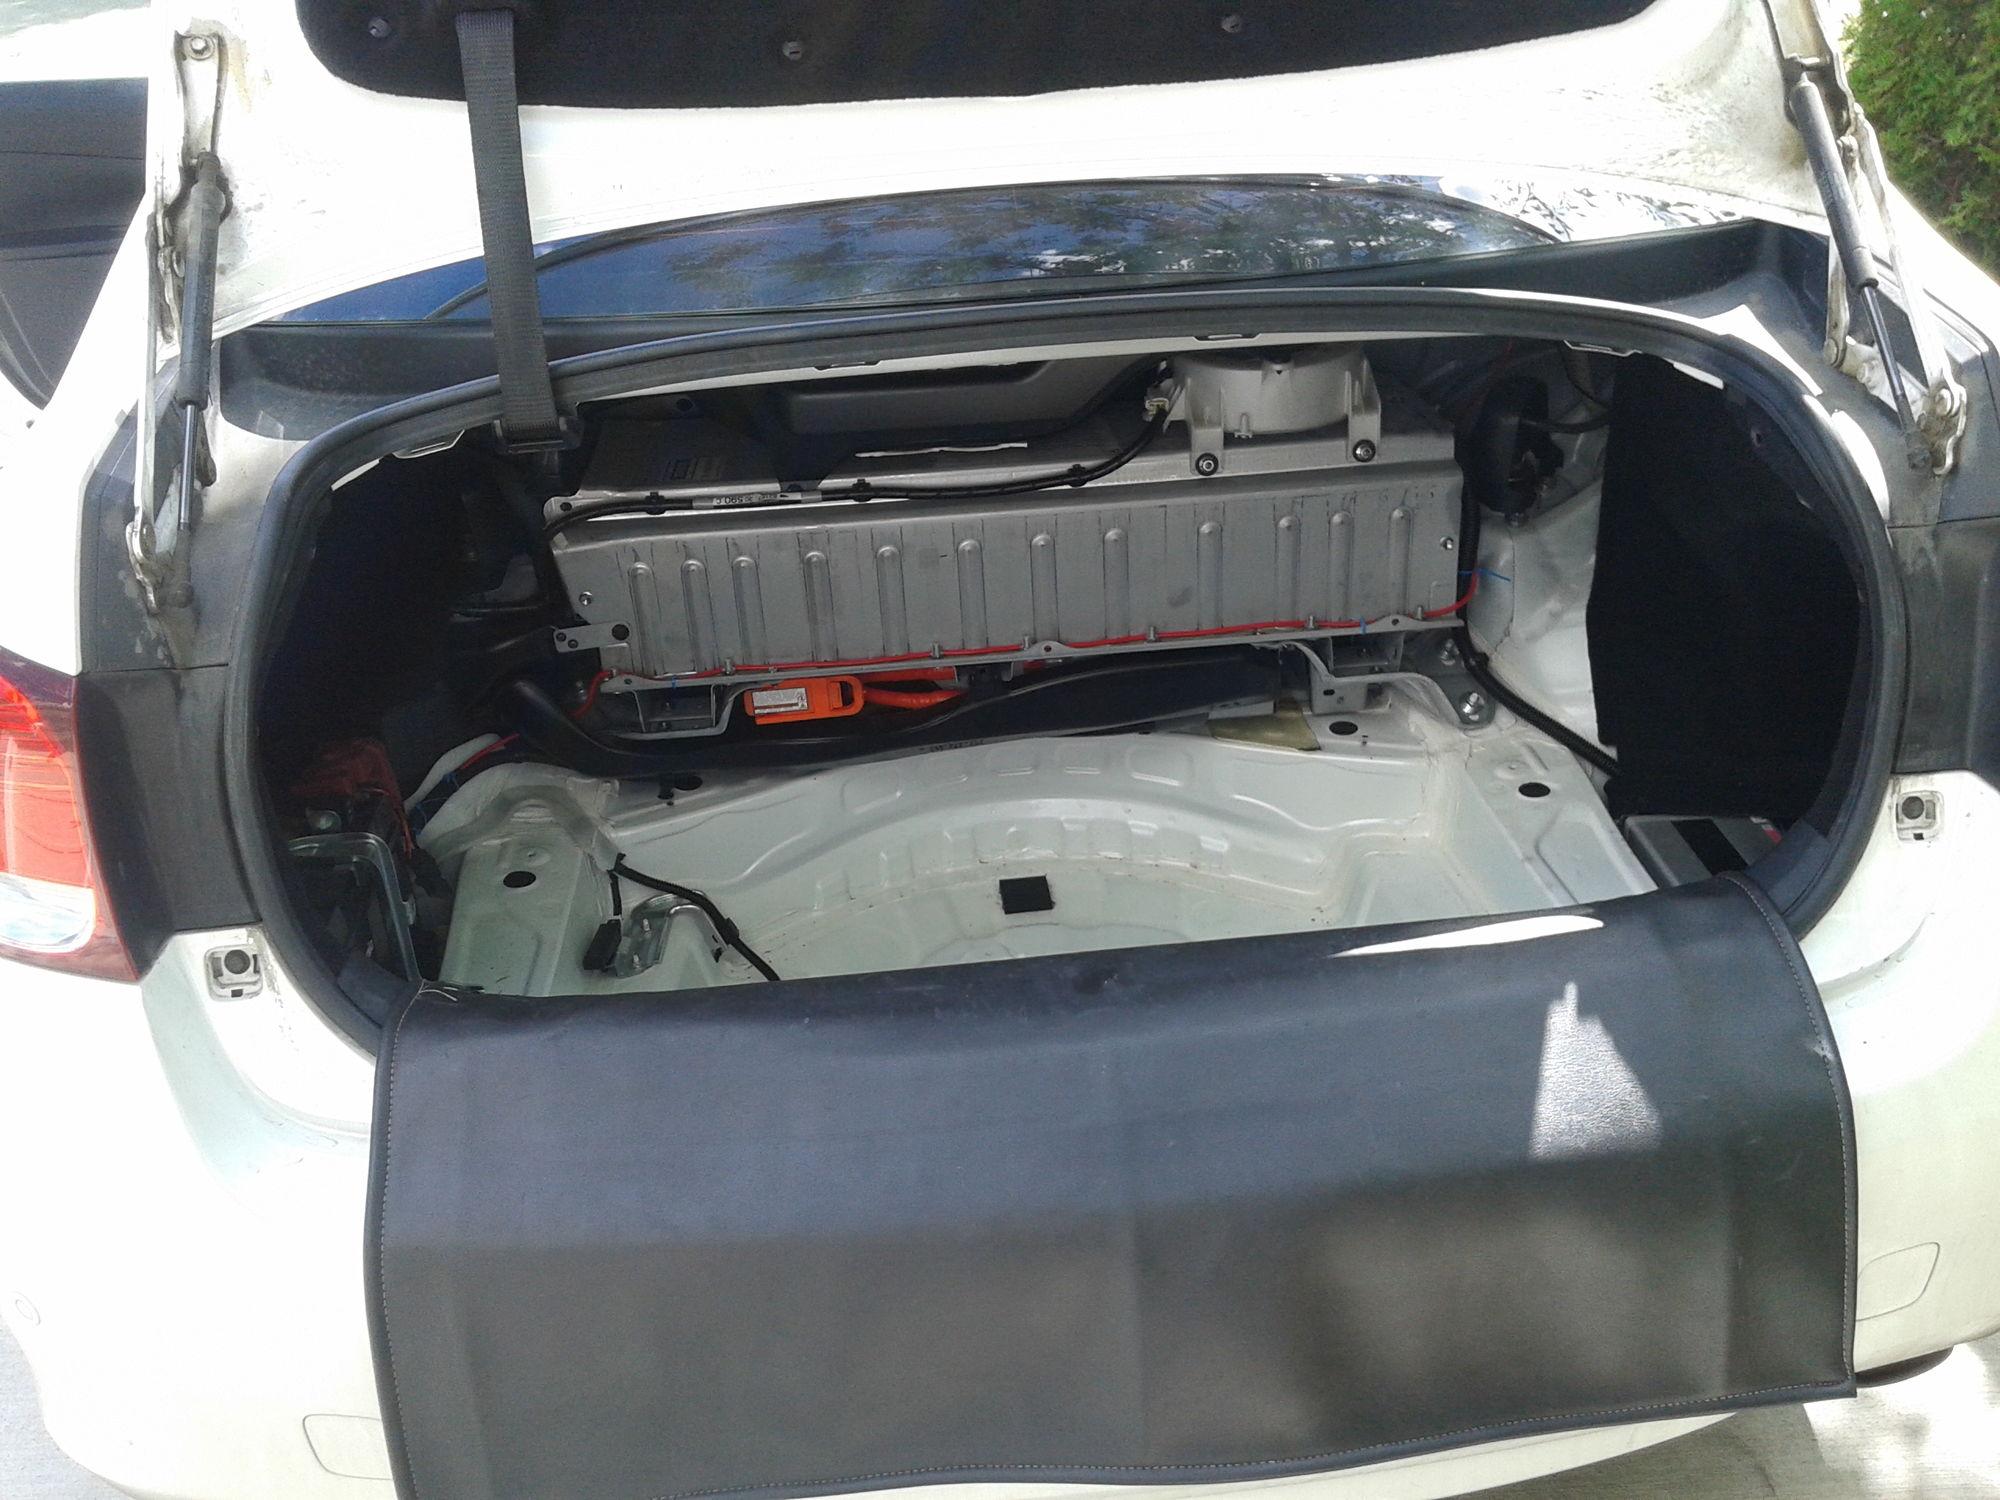 Prius Battery Replacement >> GS 450h hybrid battery - ClubLexus - Lexus Forum Discussion